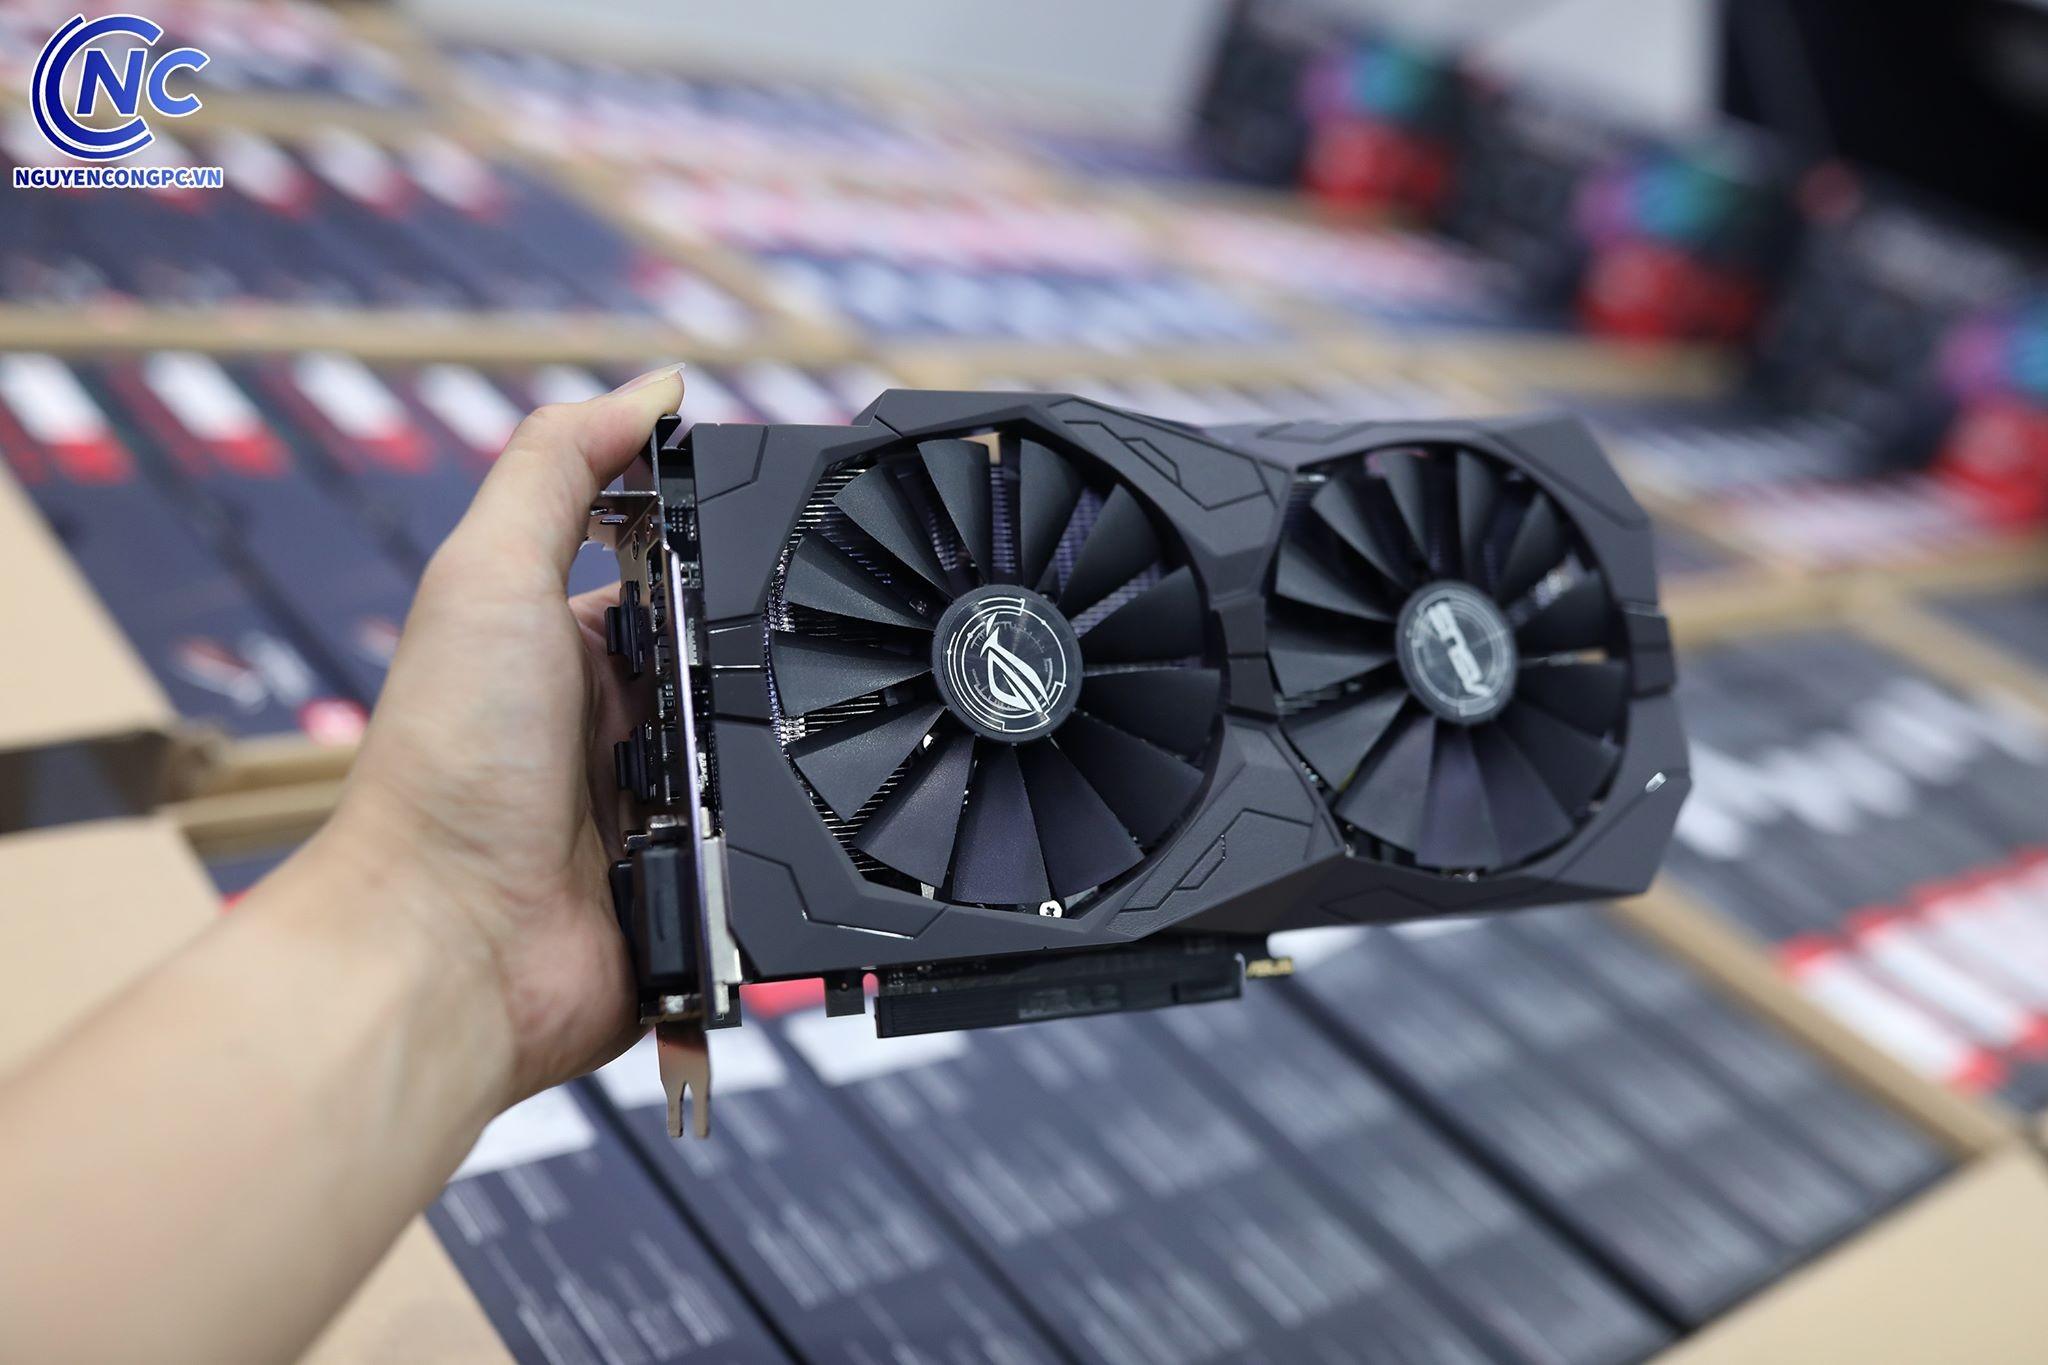 ROG STRIX RX 570 8G GAMING fan